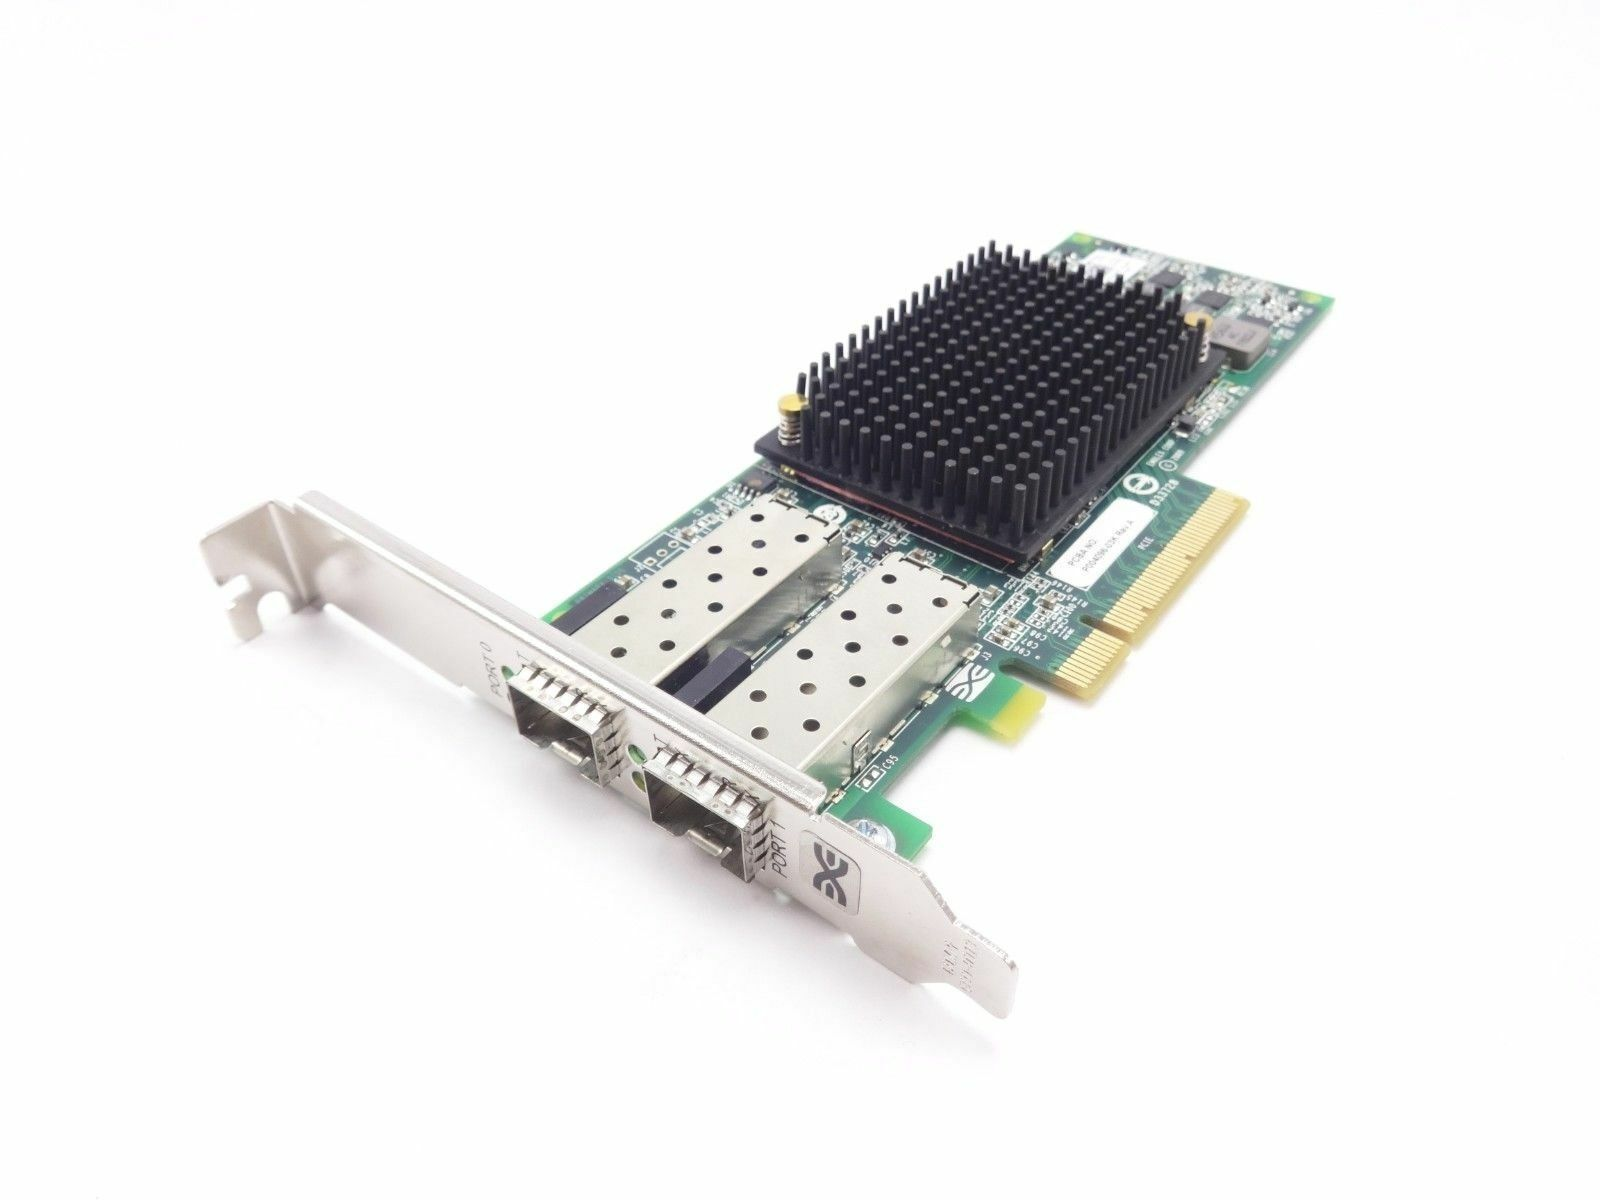 Dell Emulex 10Gbps Ethernet iSCSI Adapter OCE10102-IX-D CNA HRNHC, 0HRNHC 100%OK